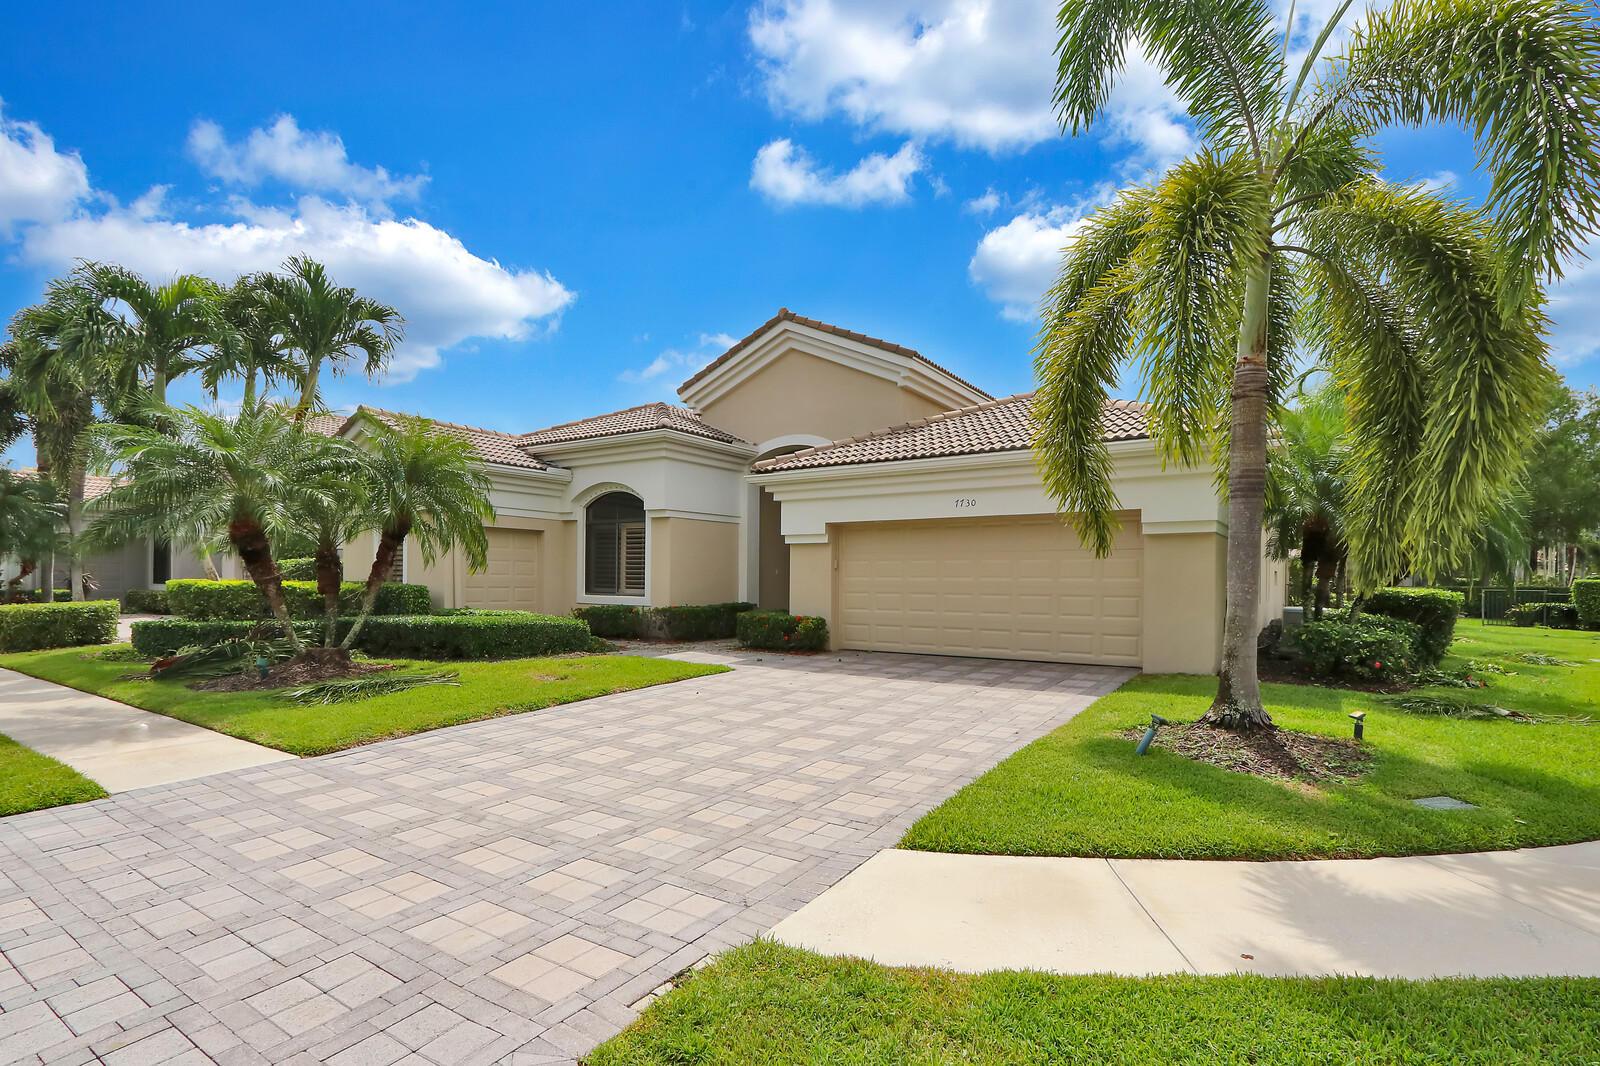 Details for 7730 Blue Heron Way, West Palm Beach, FL 33412